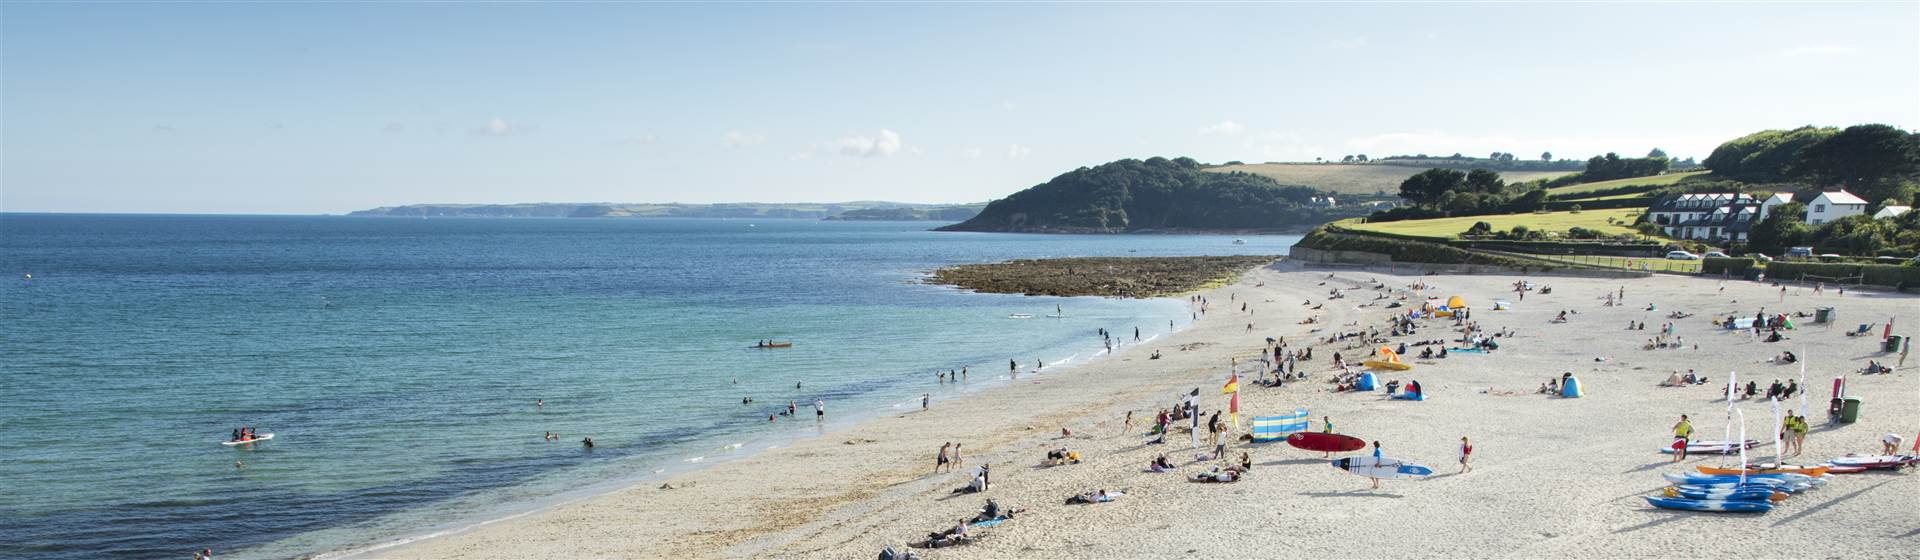 Gyllyngvase Beach Falmouth - Matt Jessop